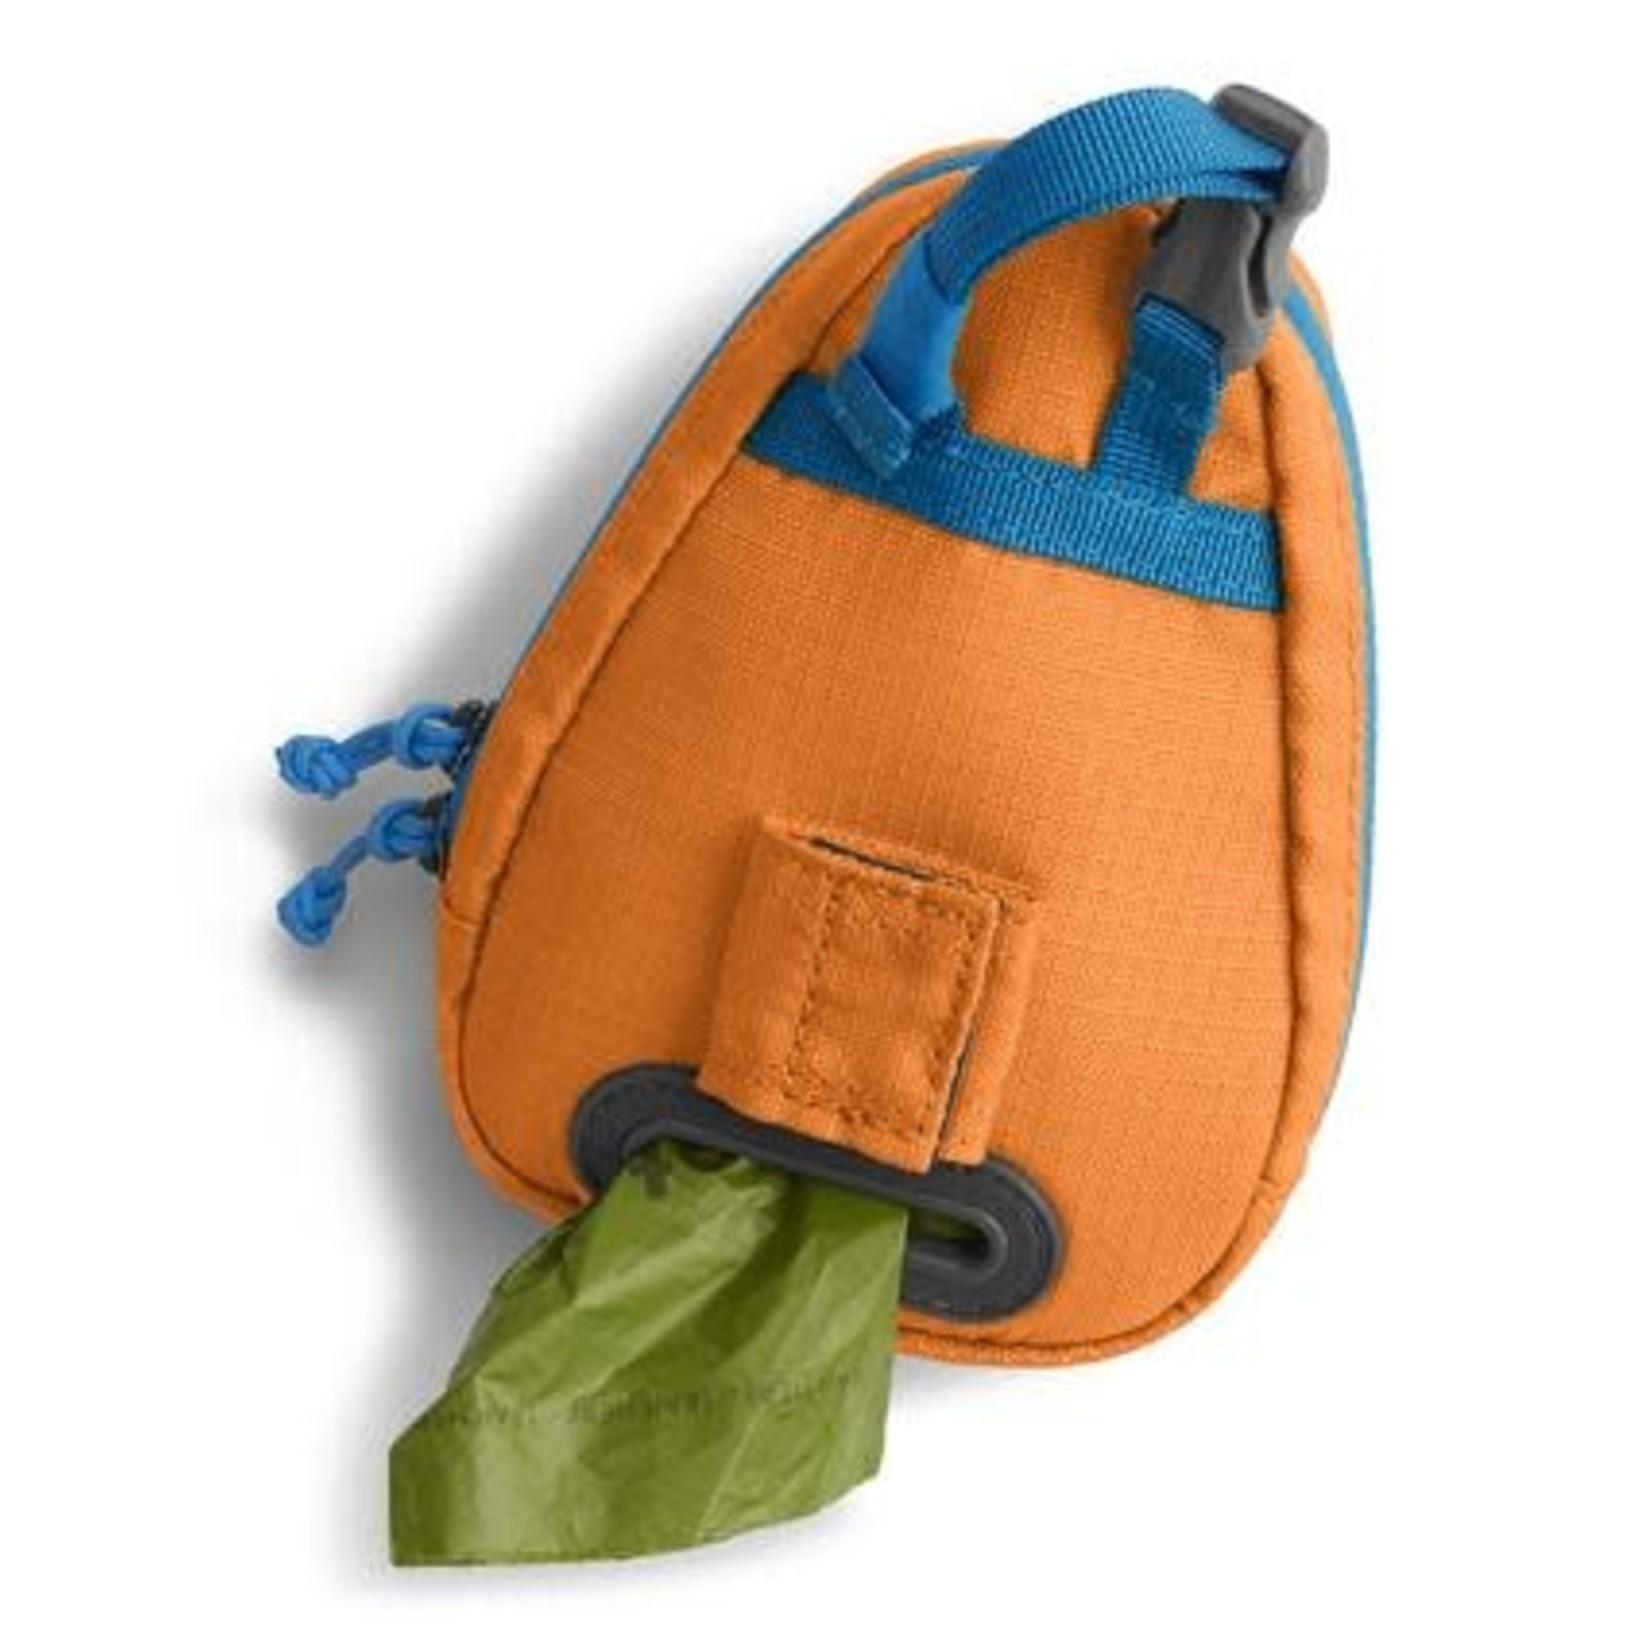 Ruff Wear Ruffwear Stash Bag Orange Poppy